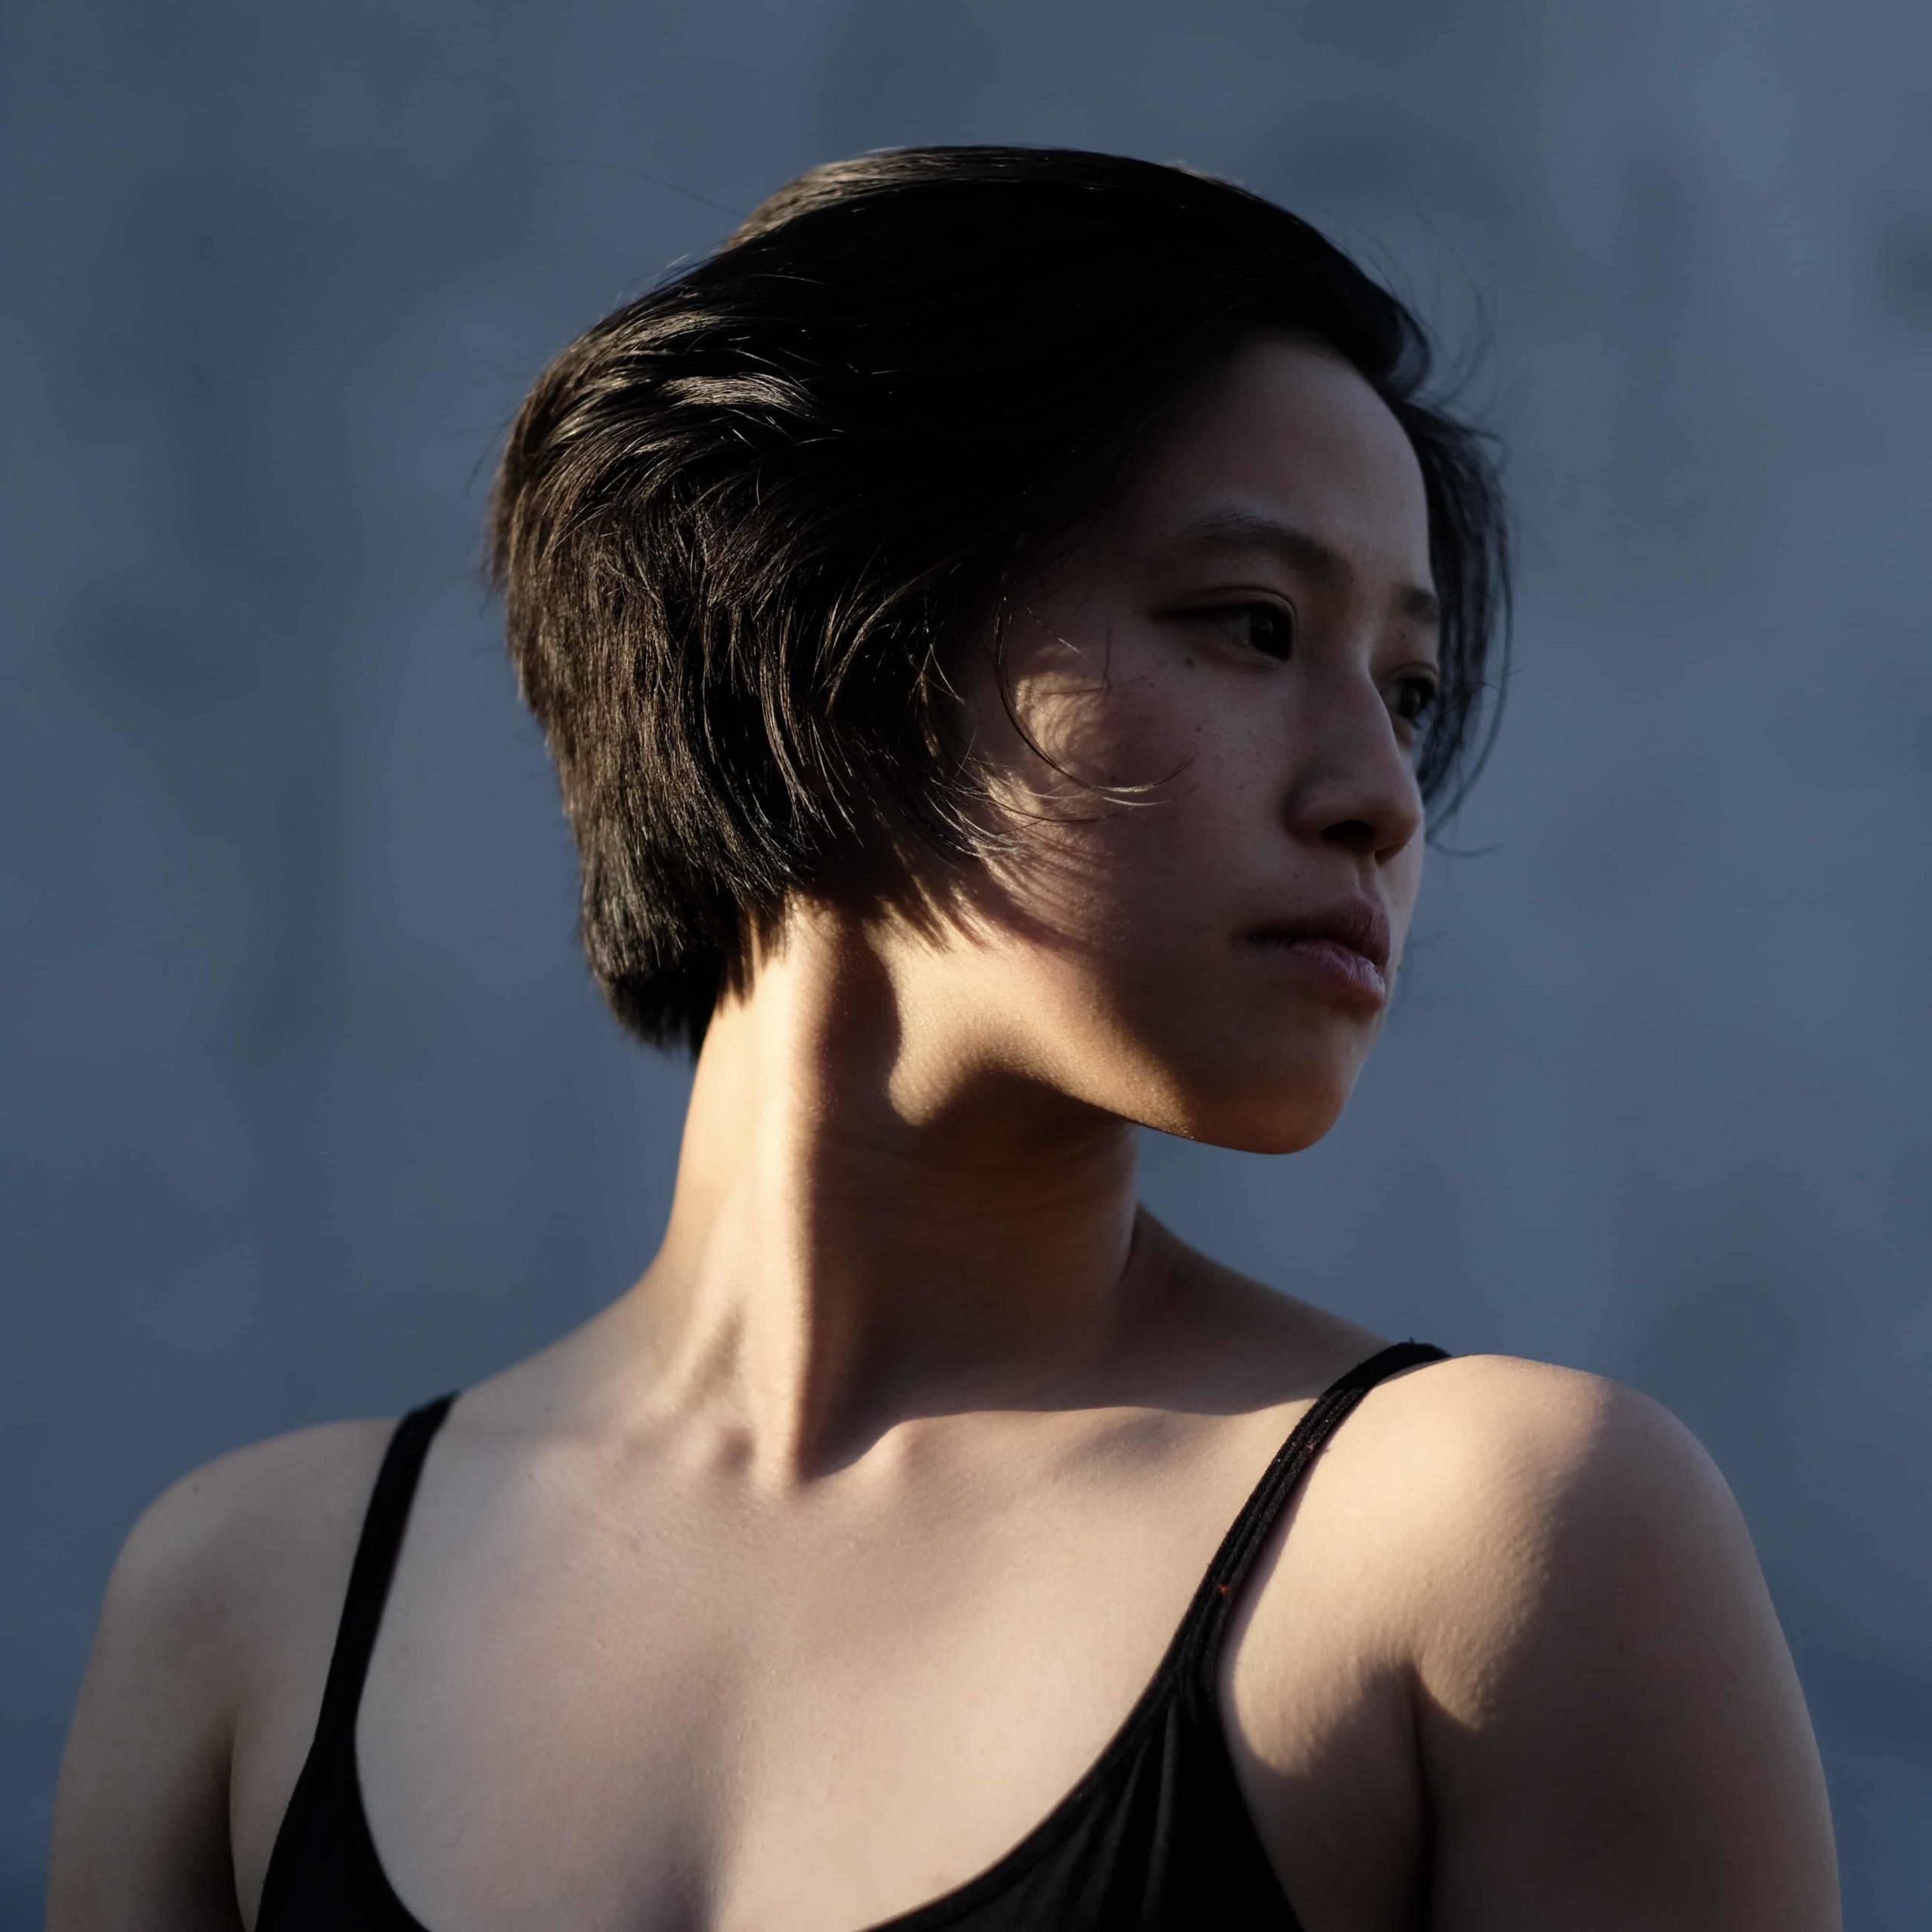 Kaori Ishiguro